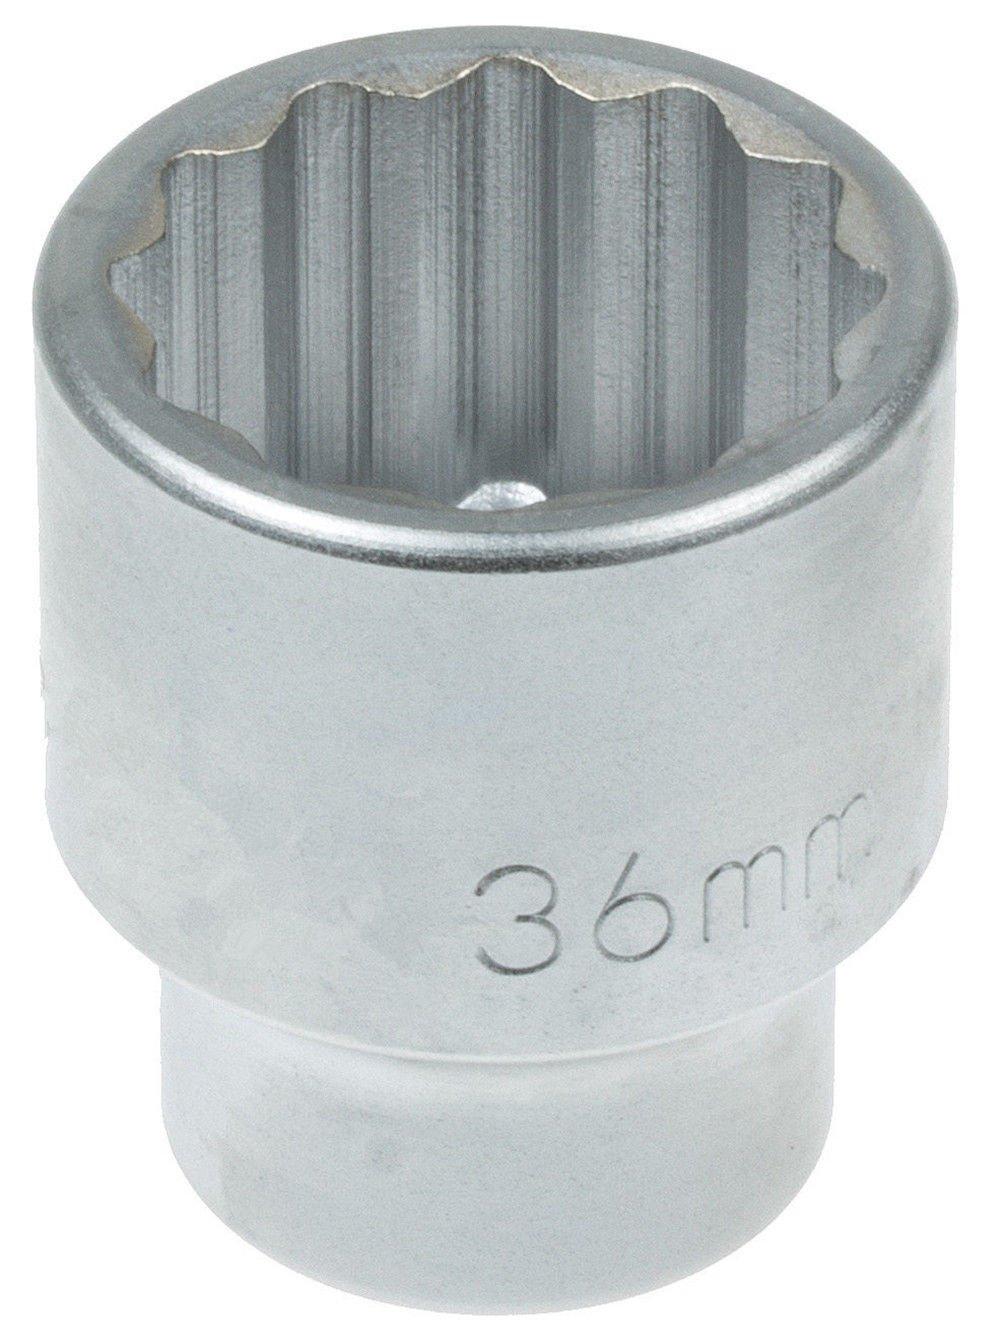 Jumbo Stecknuss f/ür Schl/üssel 3//4 1 Antrieb 17~75 mm metrisch MM 12-kant Nuss 36mm